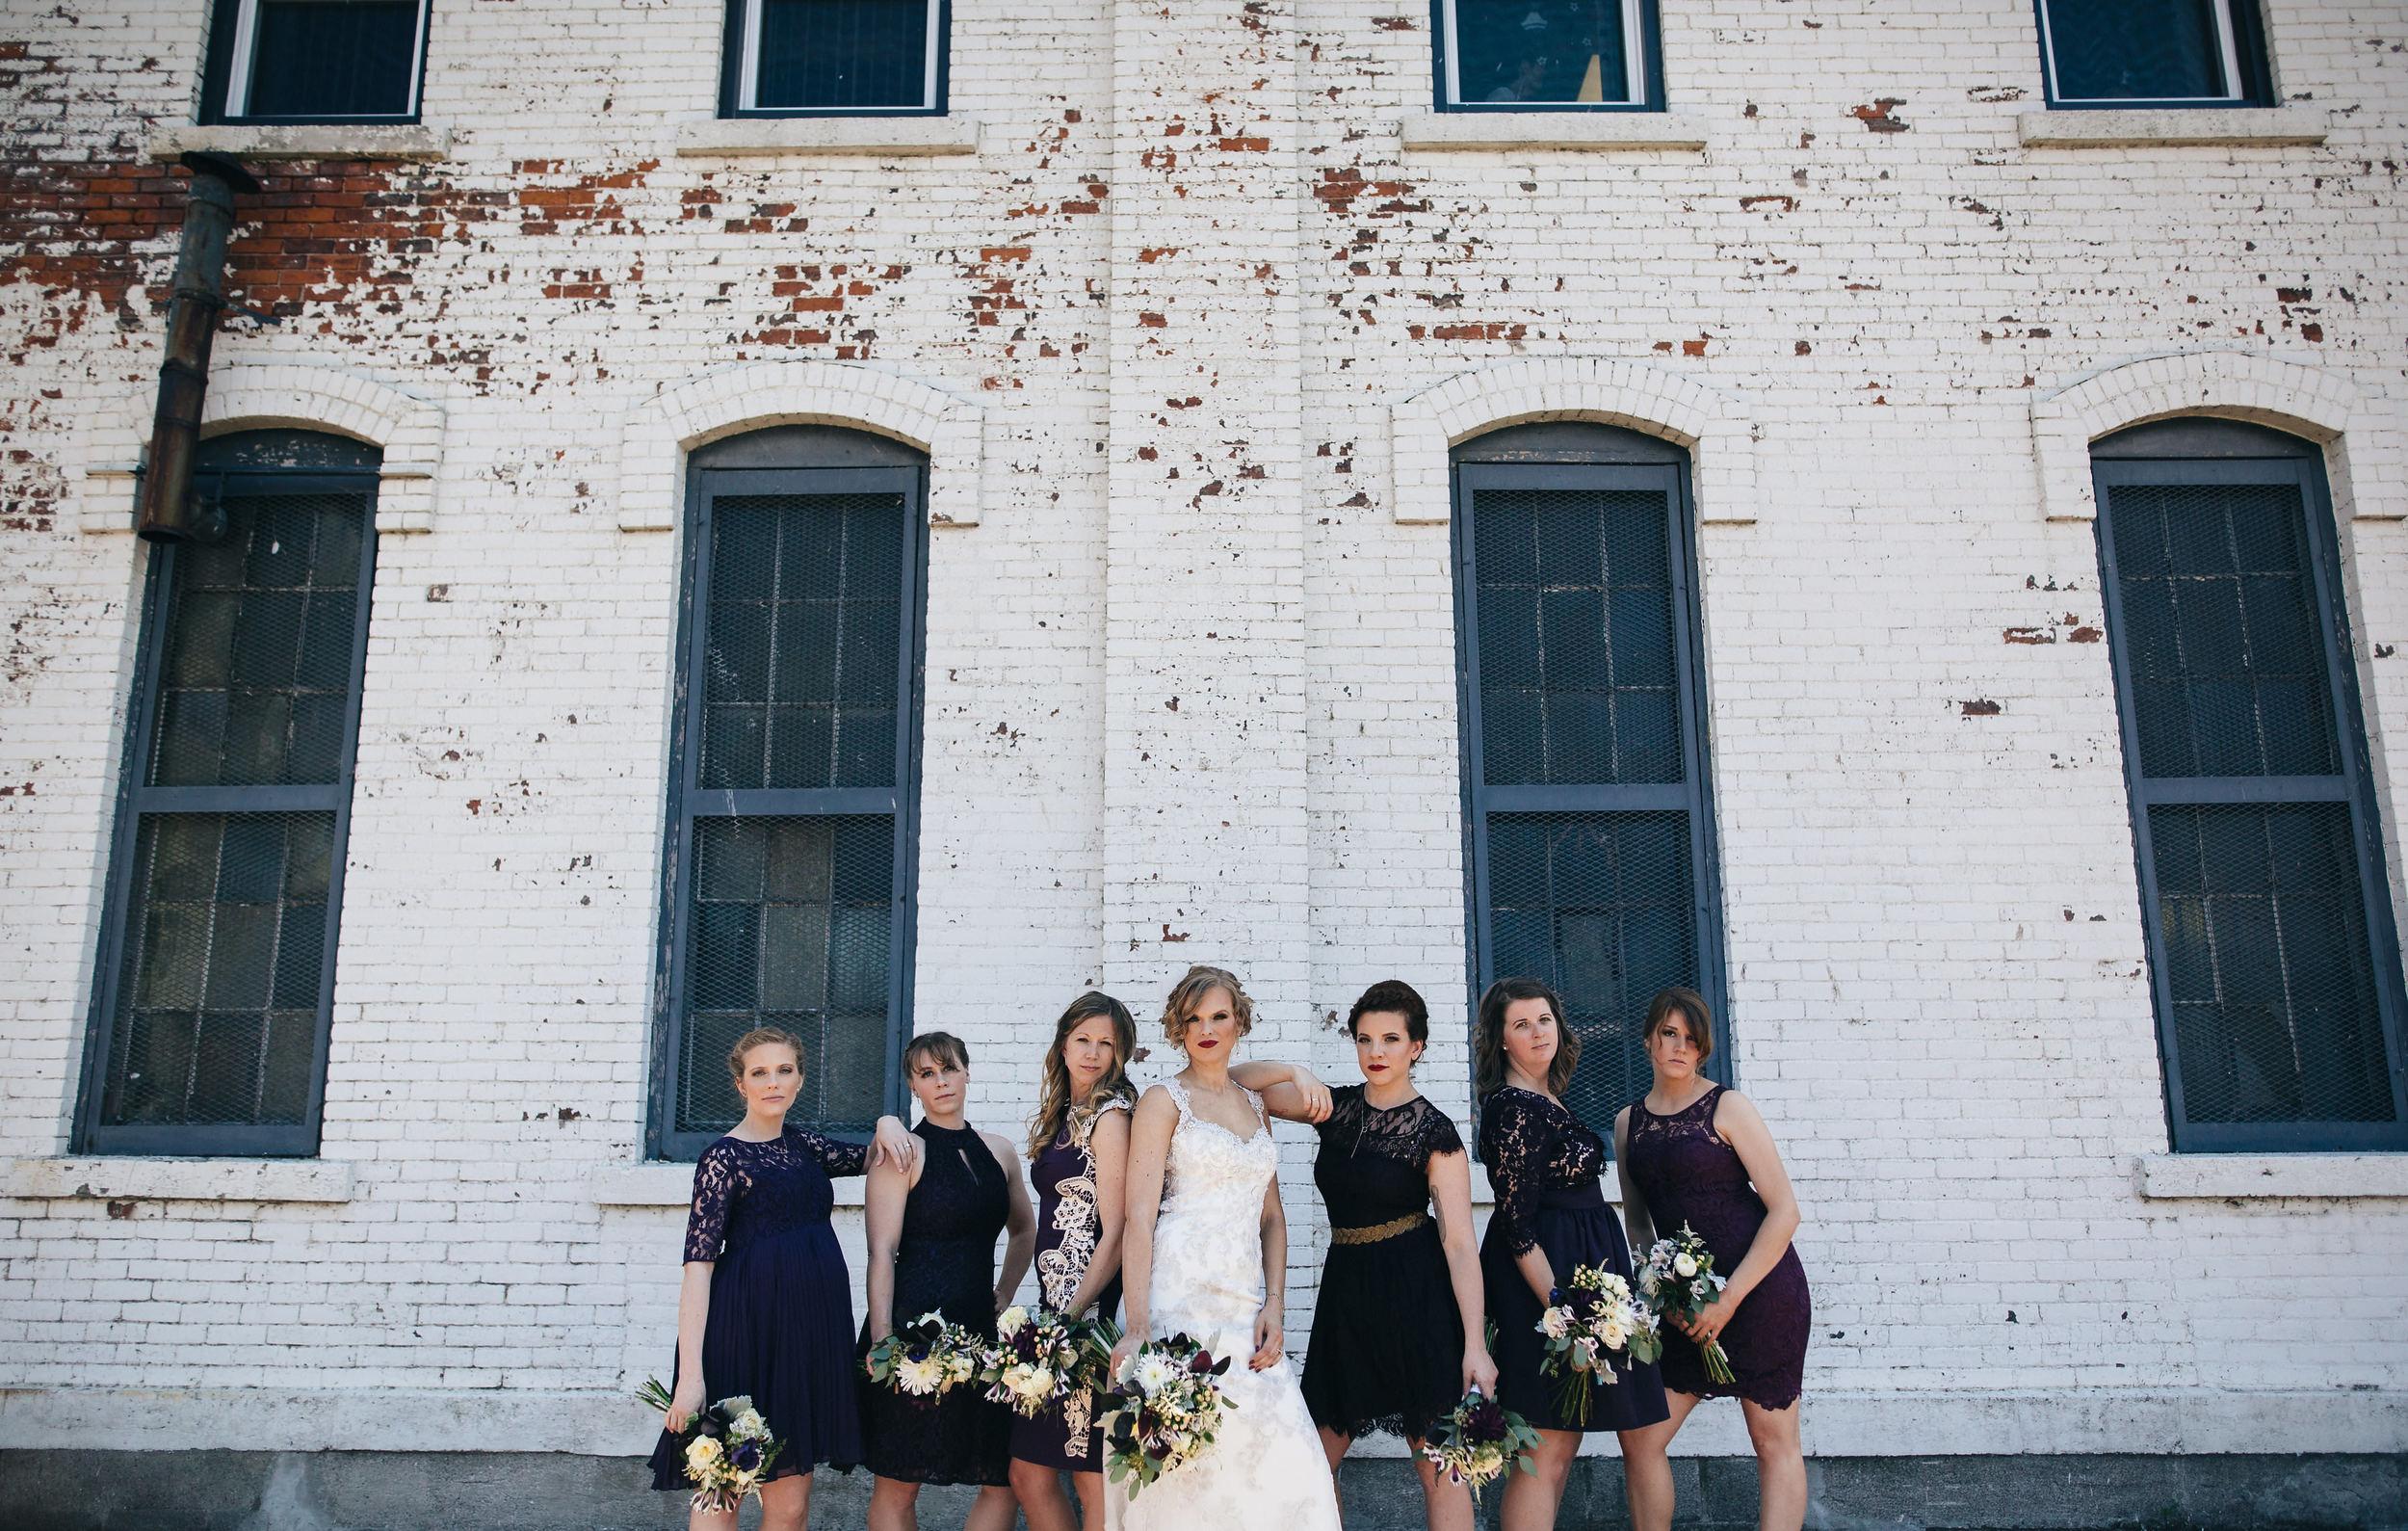 Purple wedding, bridesmaids photography in Sandusky, Ohio.